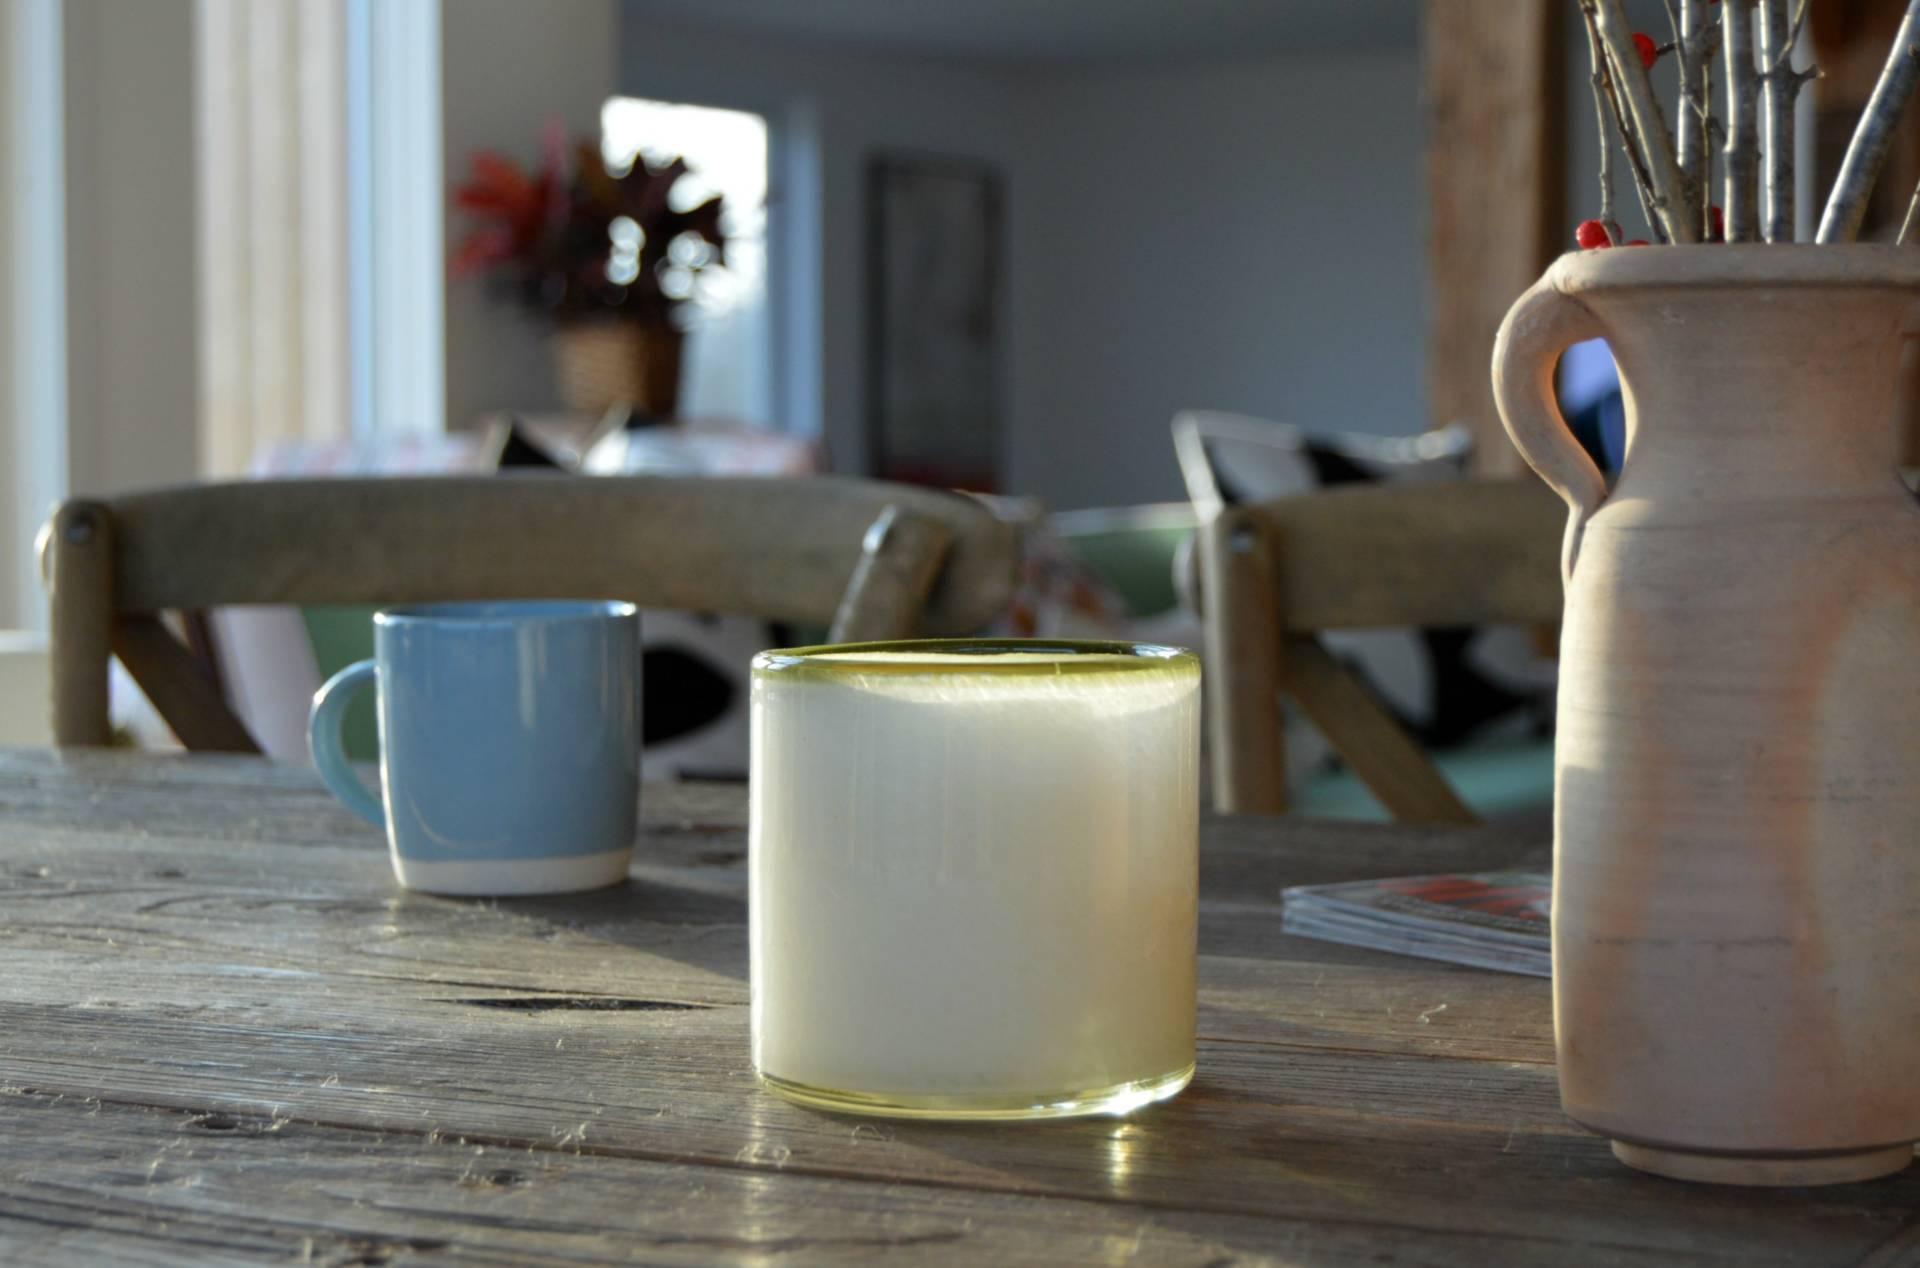 lafco-ski-lodge-candle-inhautepursuit-favorite-candles-blog